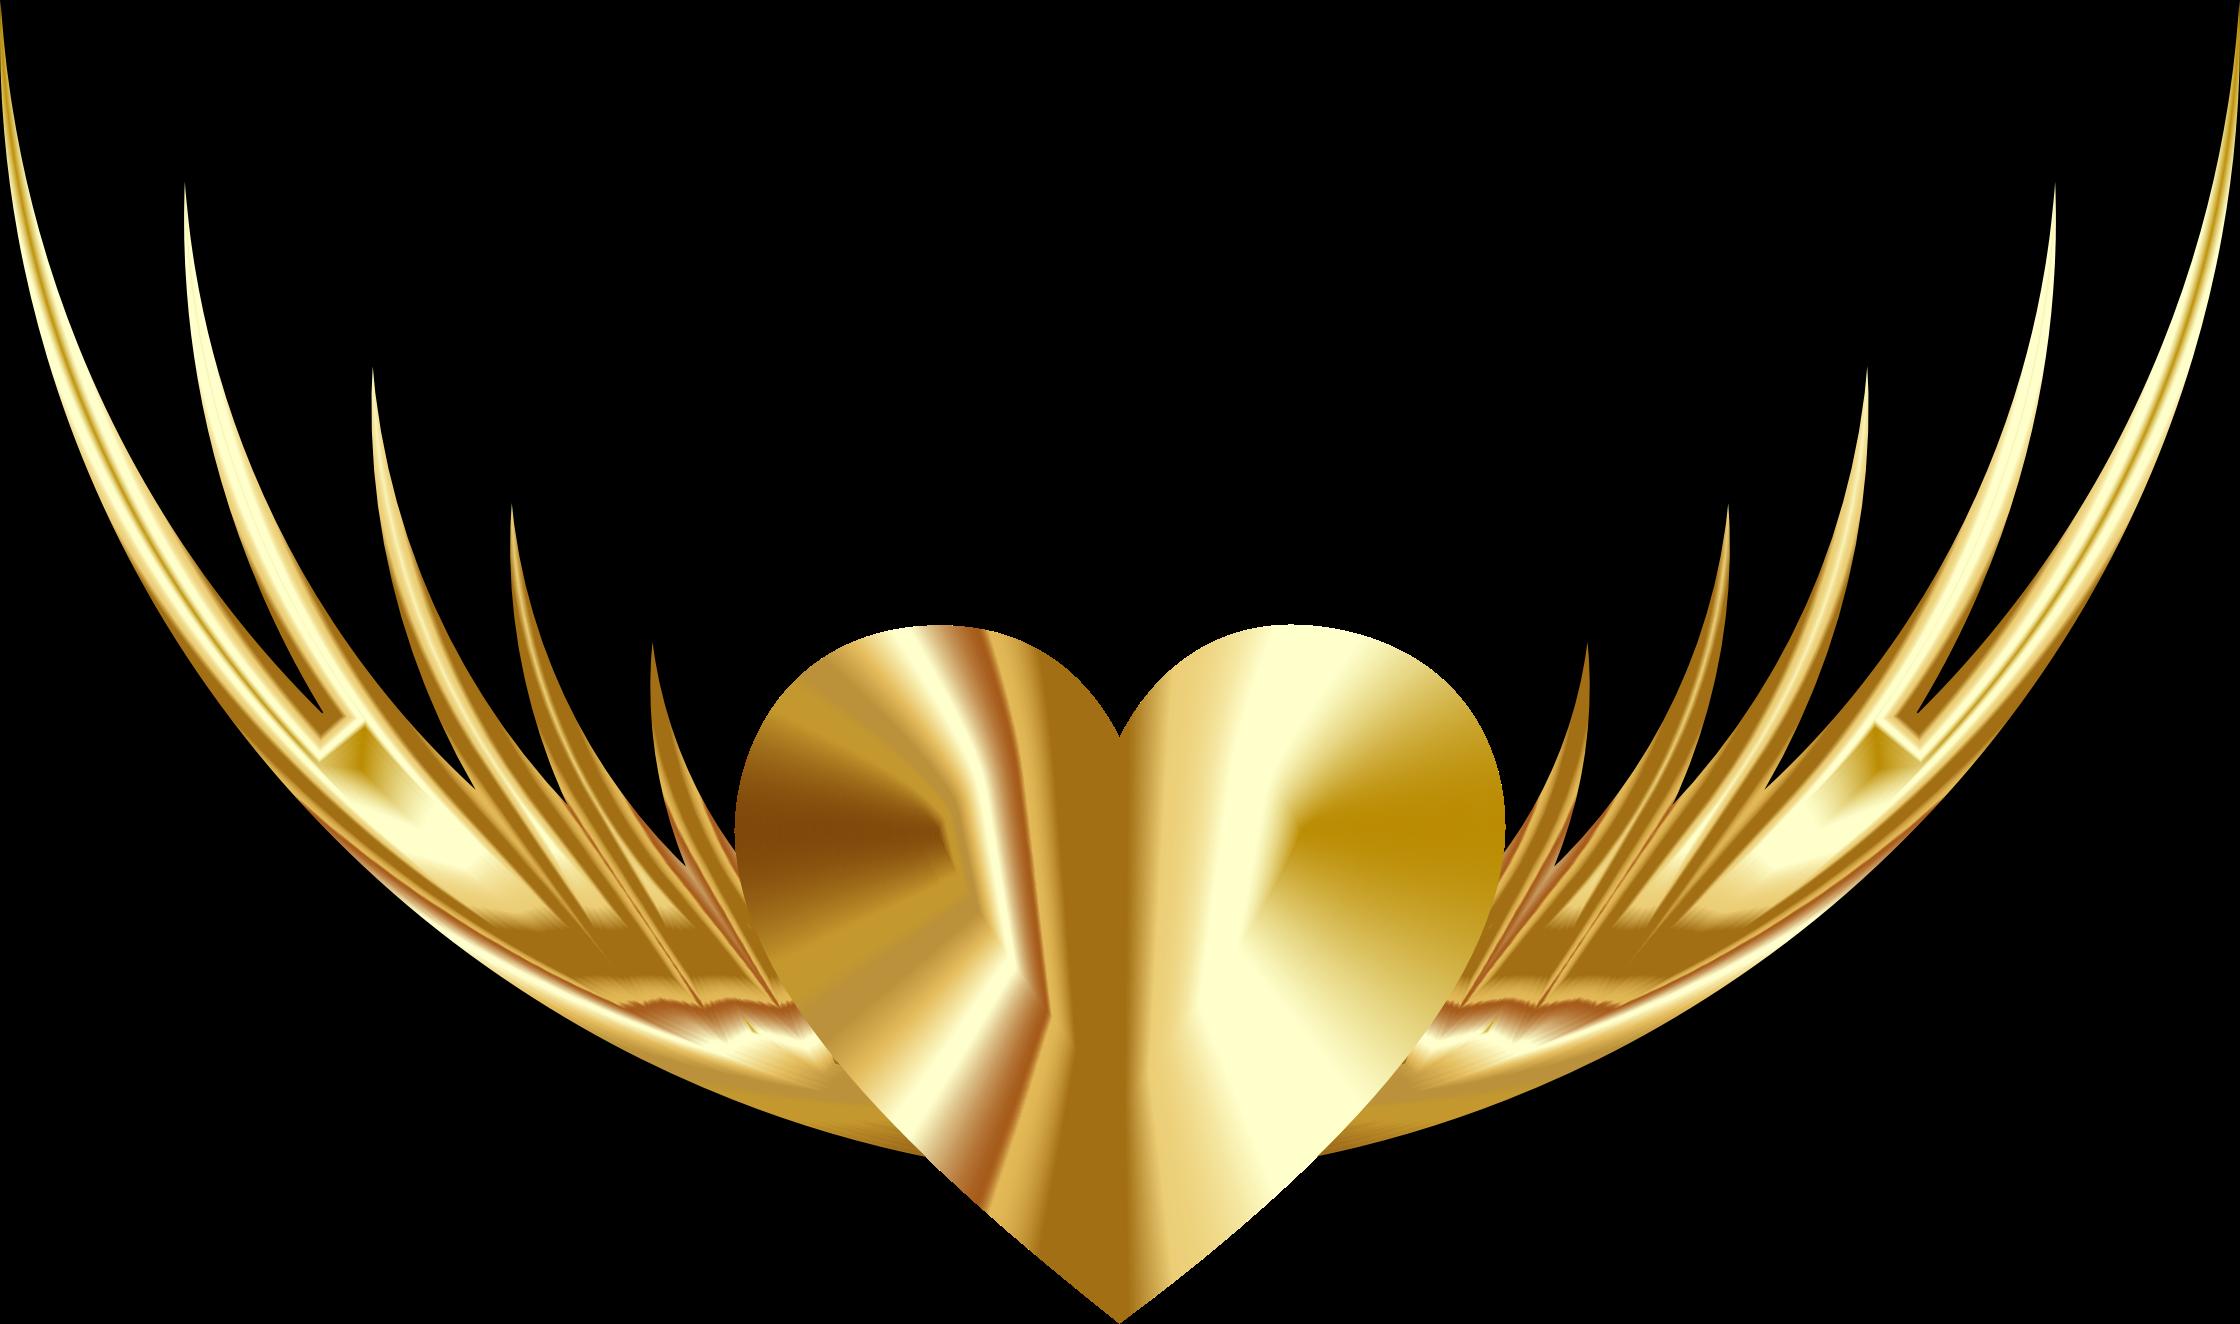 Flying heart clipart banner freeuse stock Clipart - Flying Heart 4 banner freeuse stock